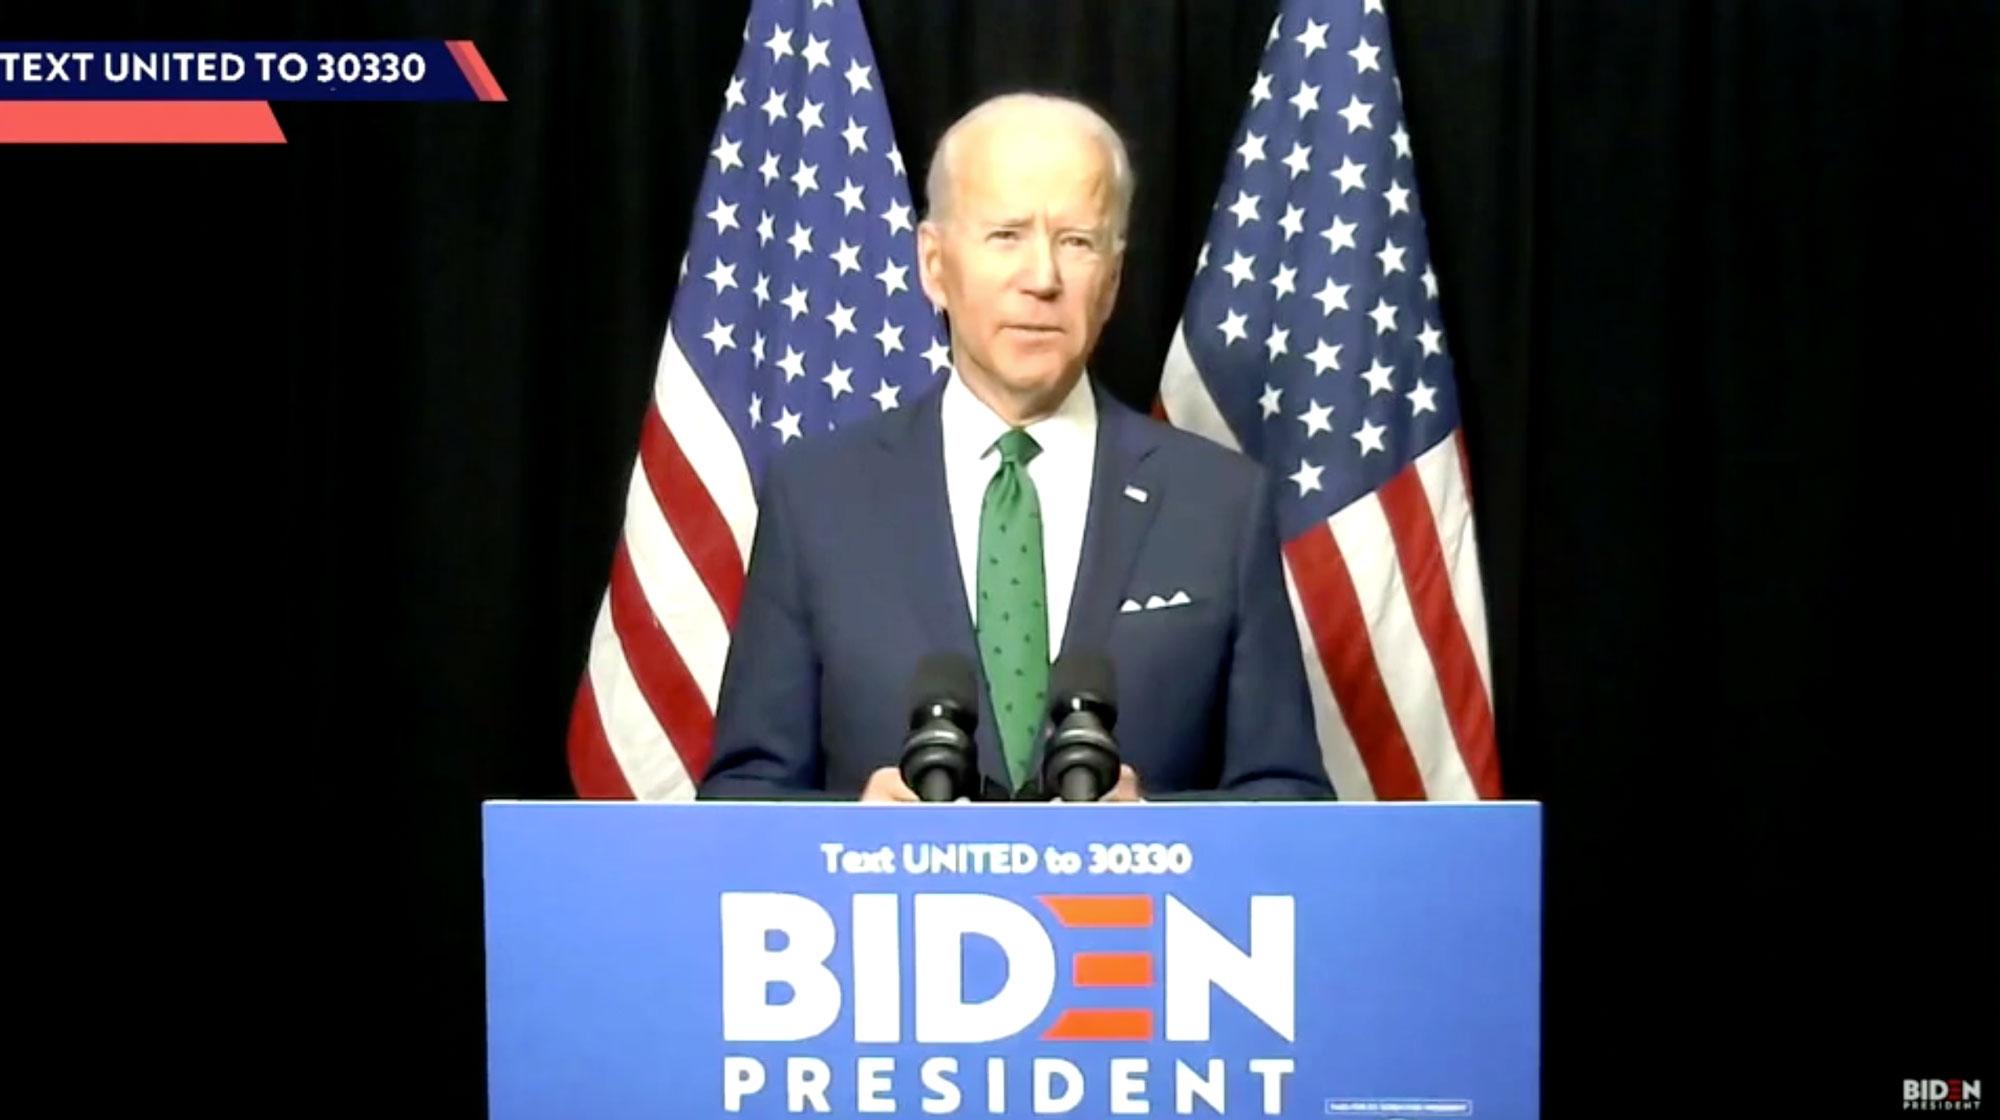 Biden For President Campaign